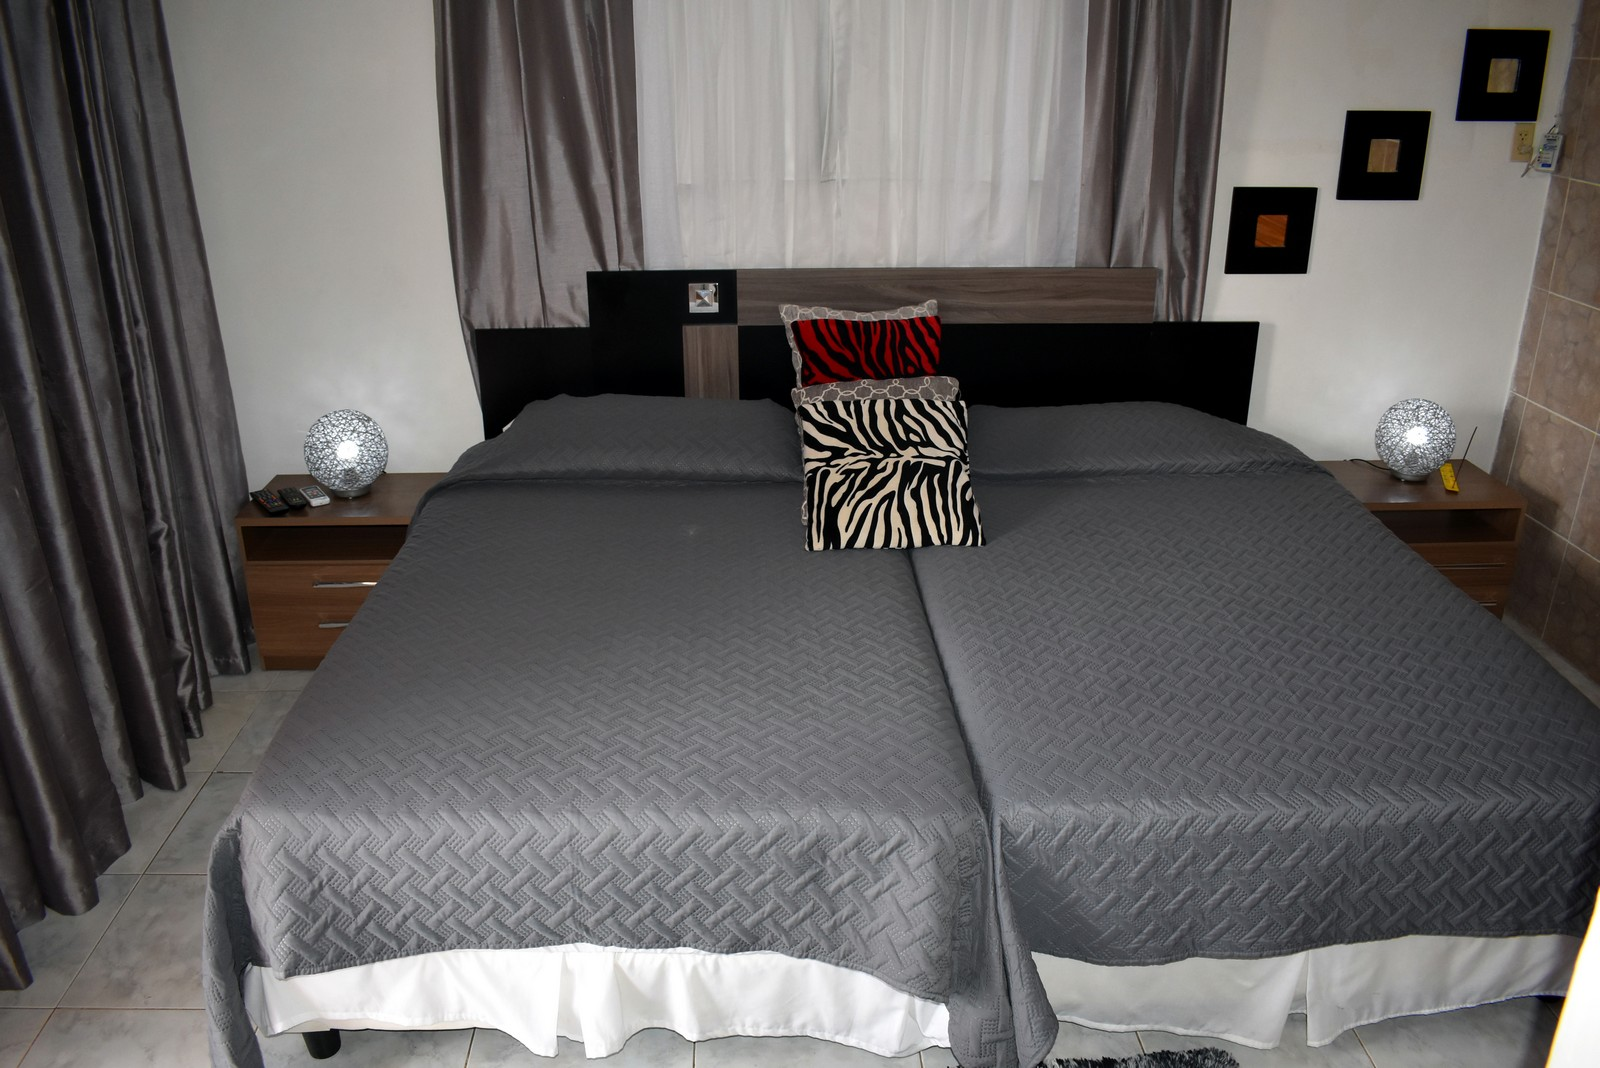 HAV901 - Room 2 Double room with shared bathroom